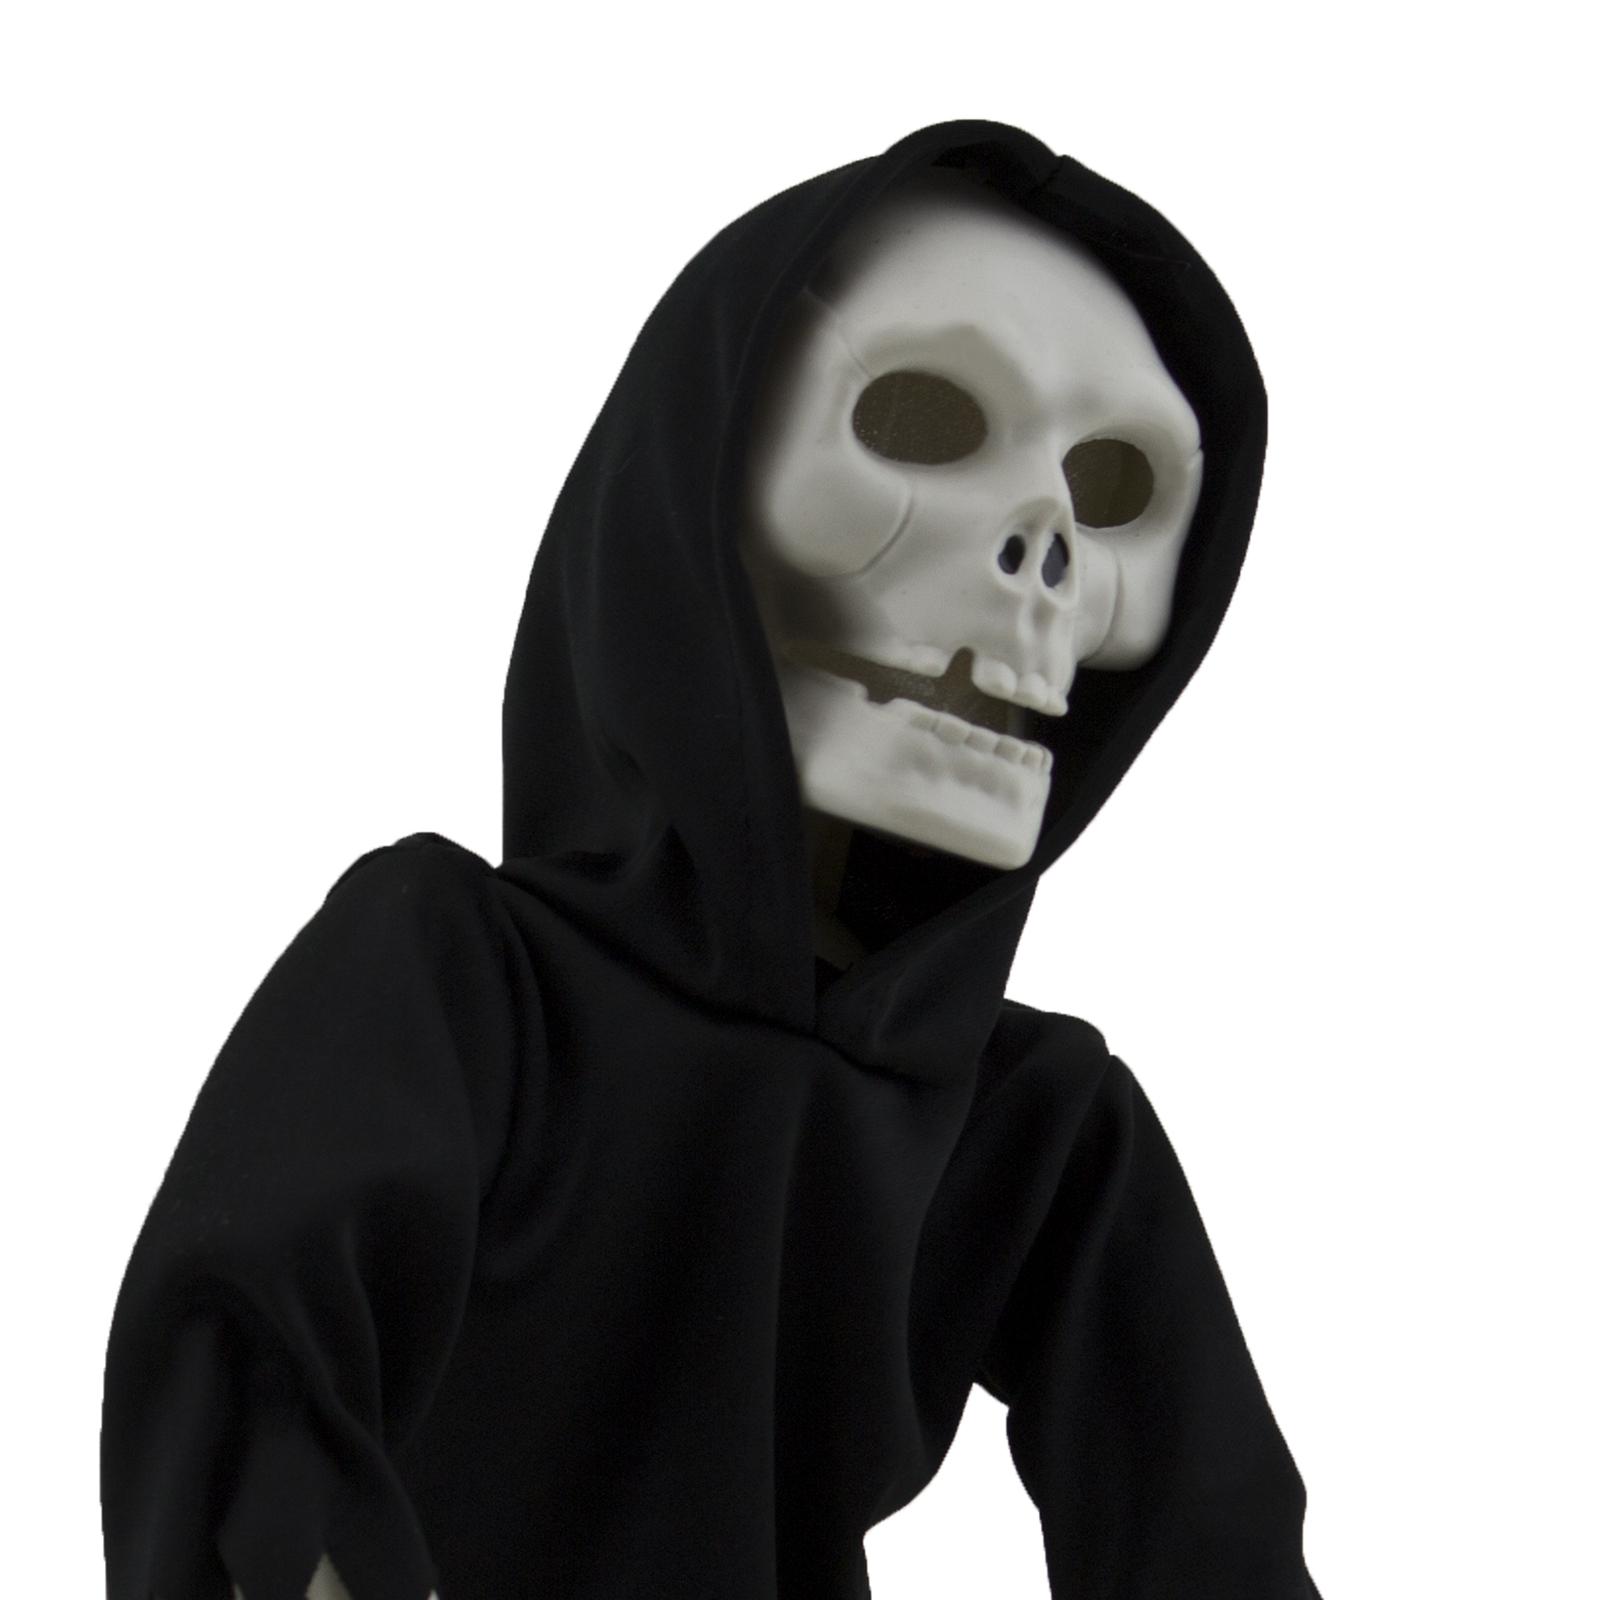 Walking talking light up grim reaper figurine skeleton for Animated flying reaper decoration